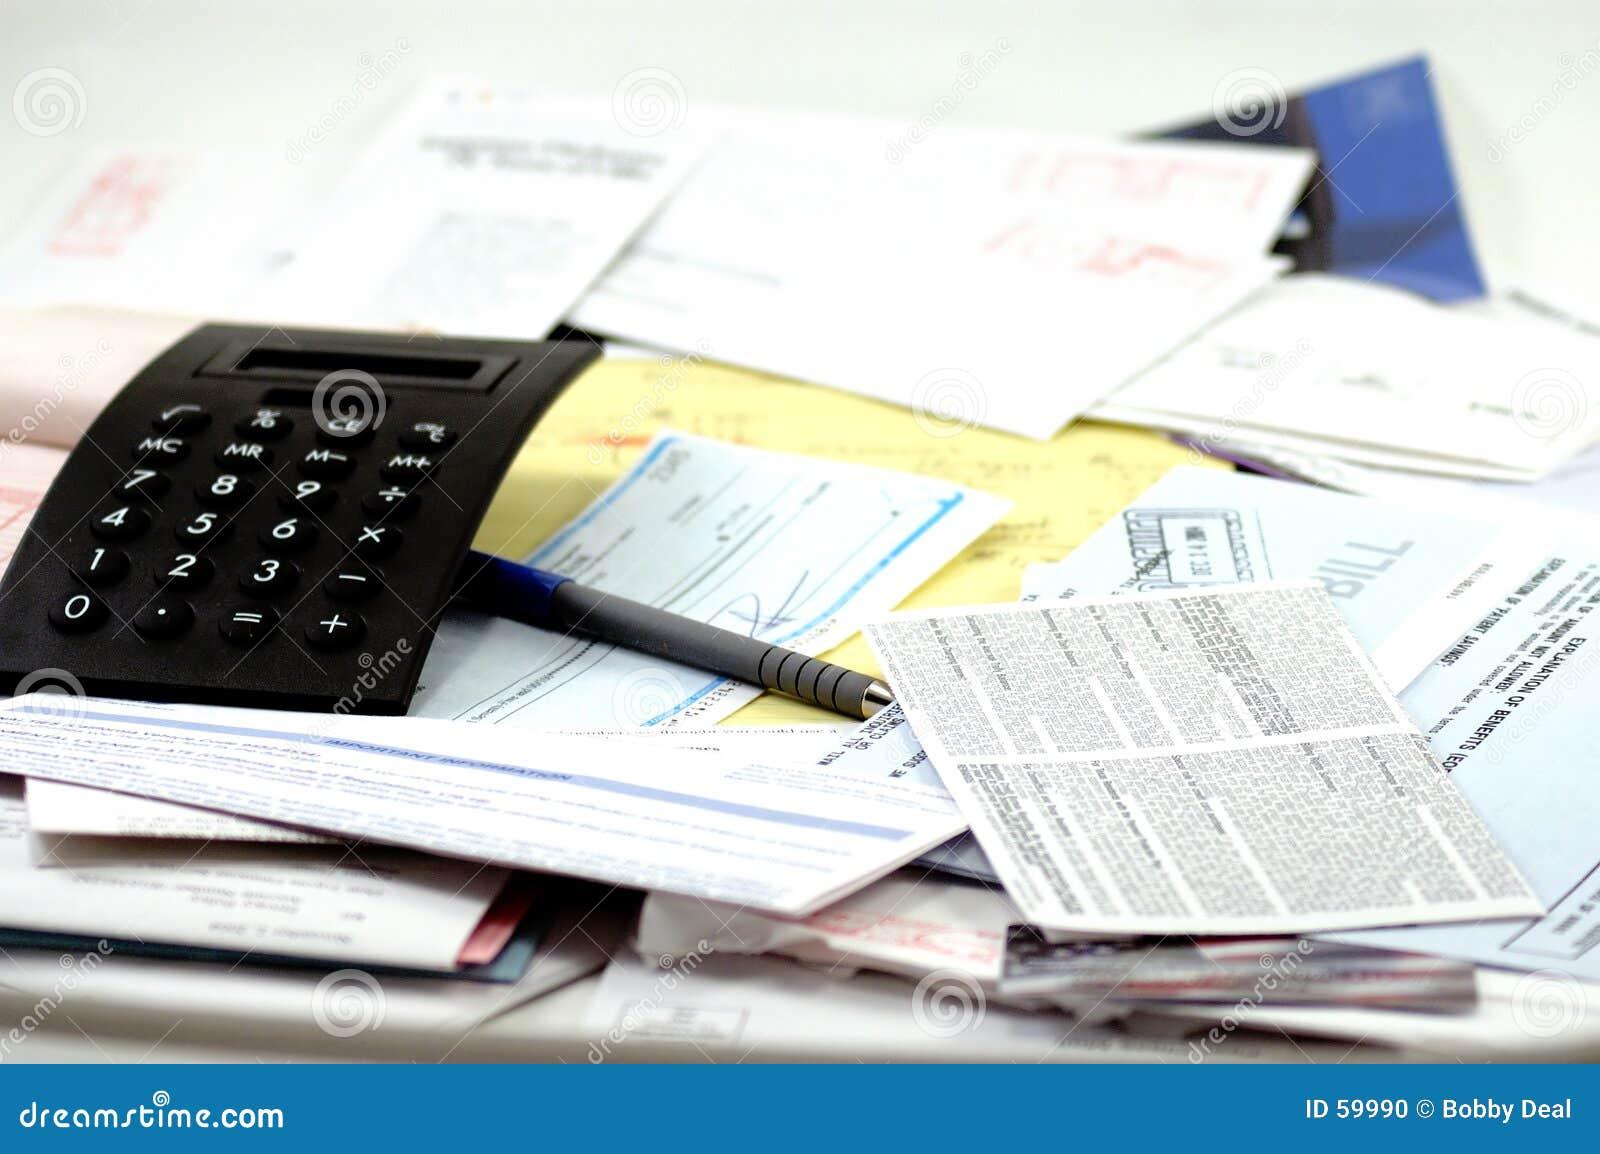 budgeting bills stock photo image of isolated legal isolation 59990